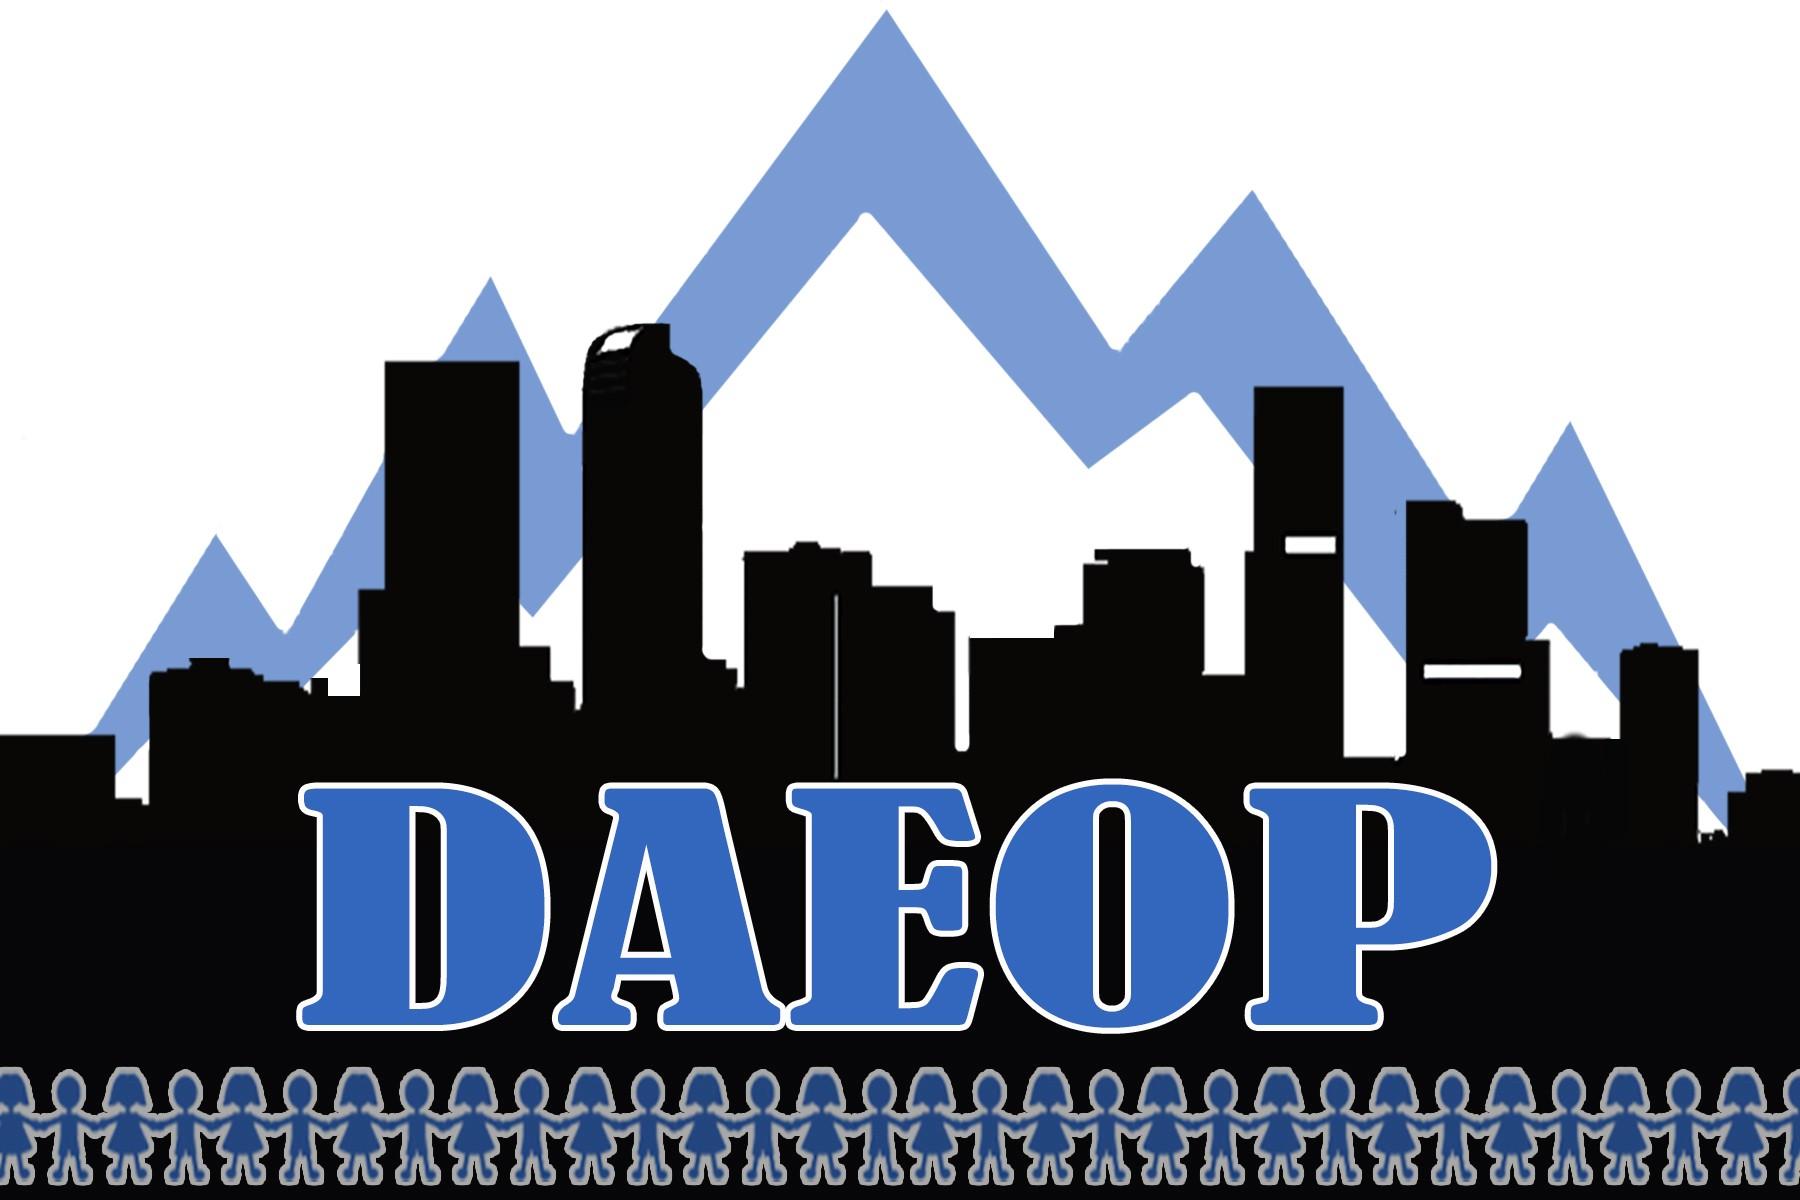 DAEOP logo.jpg